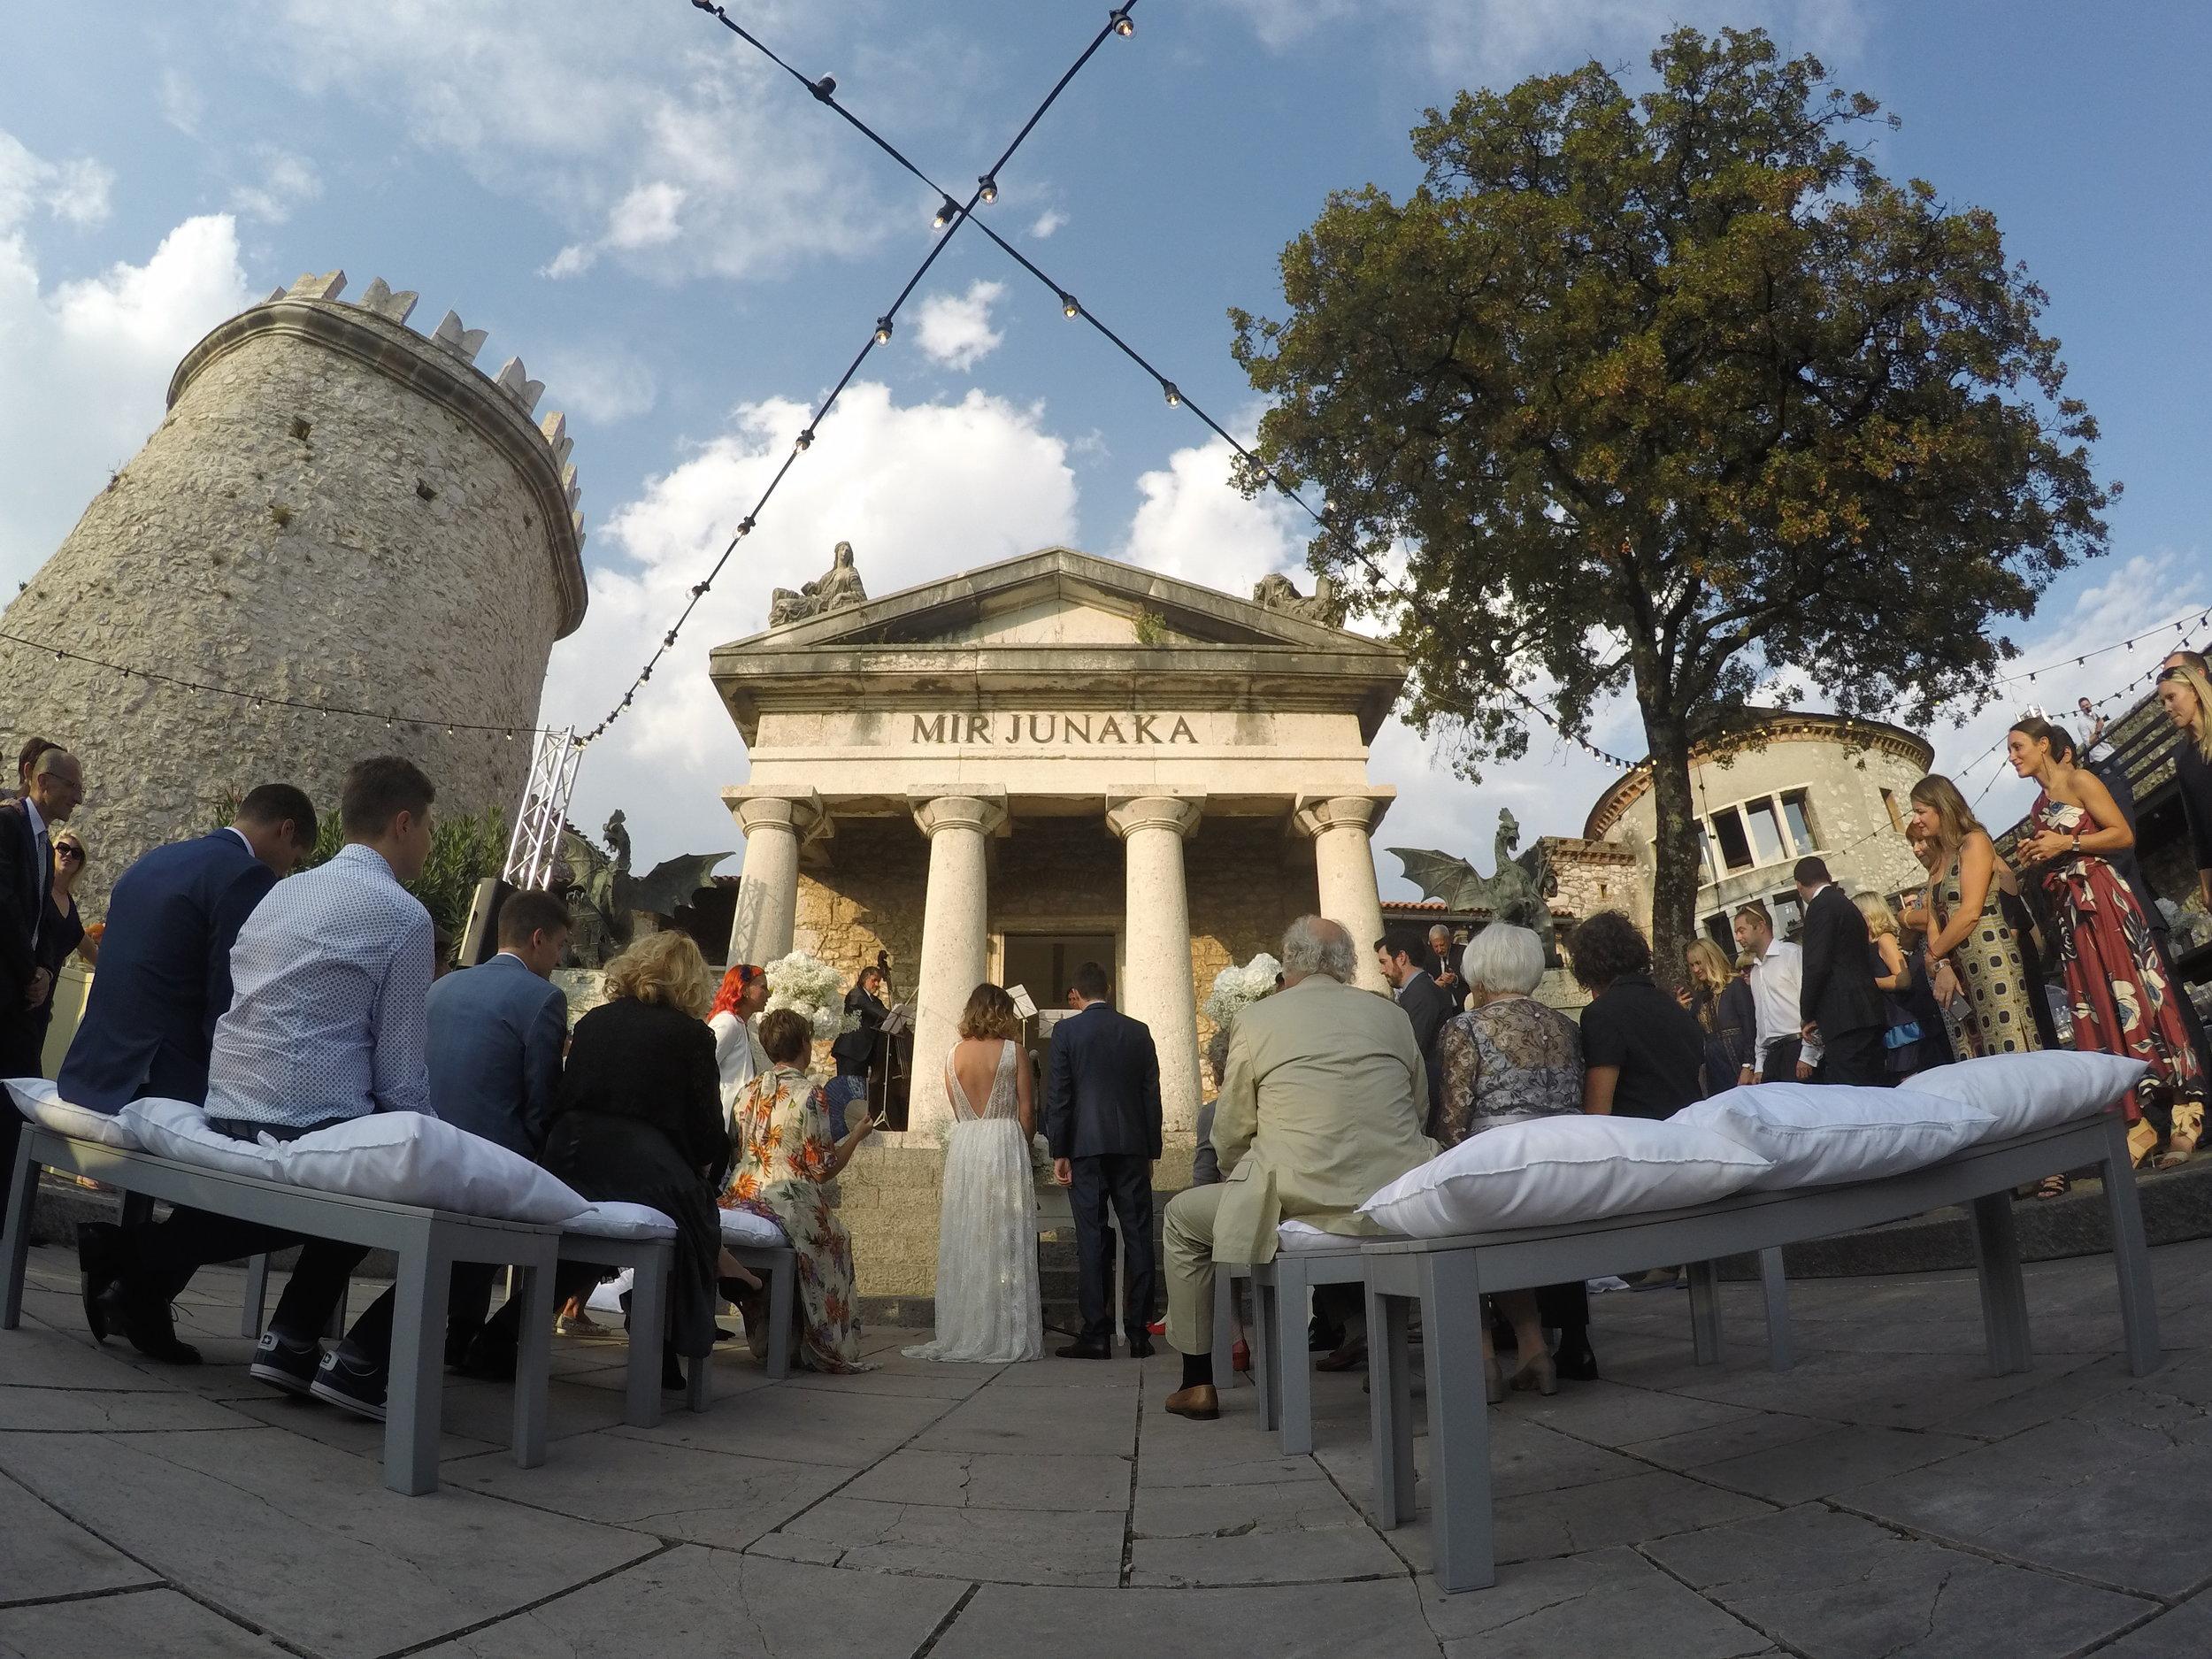 A stunning, fairy tale castle wedding celebration in Rijeka, Croatia.